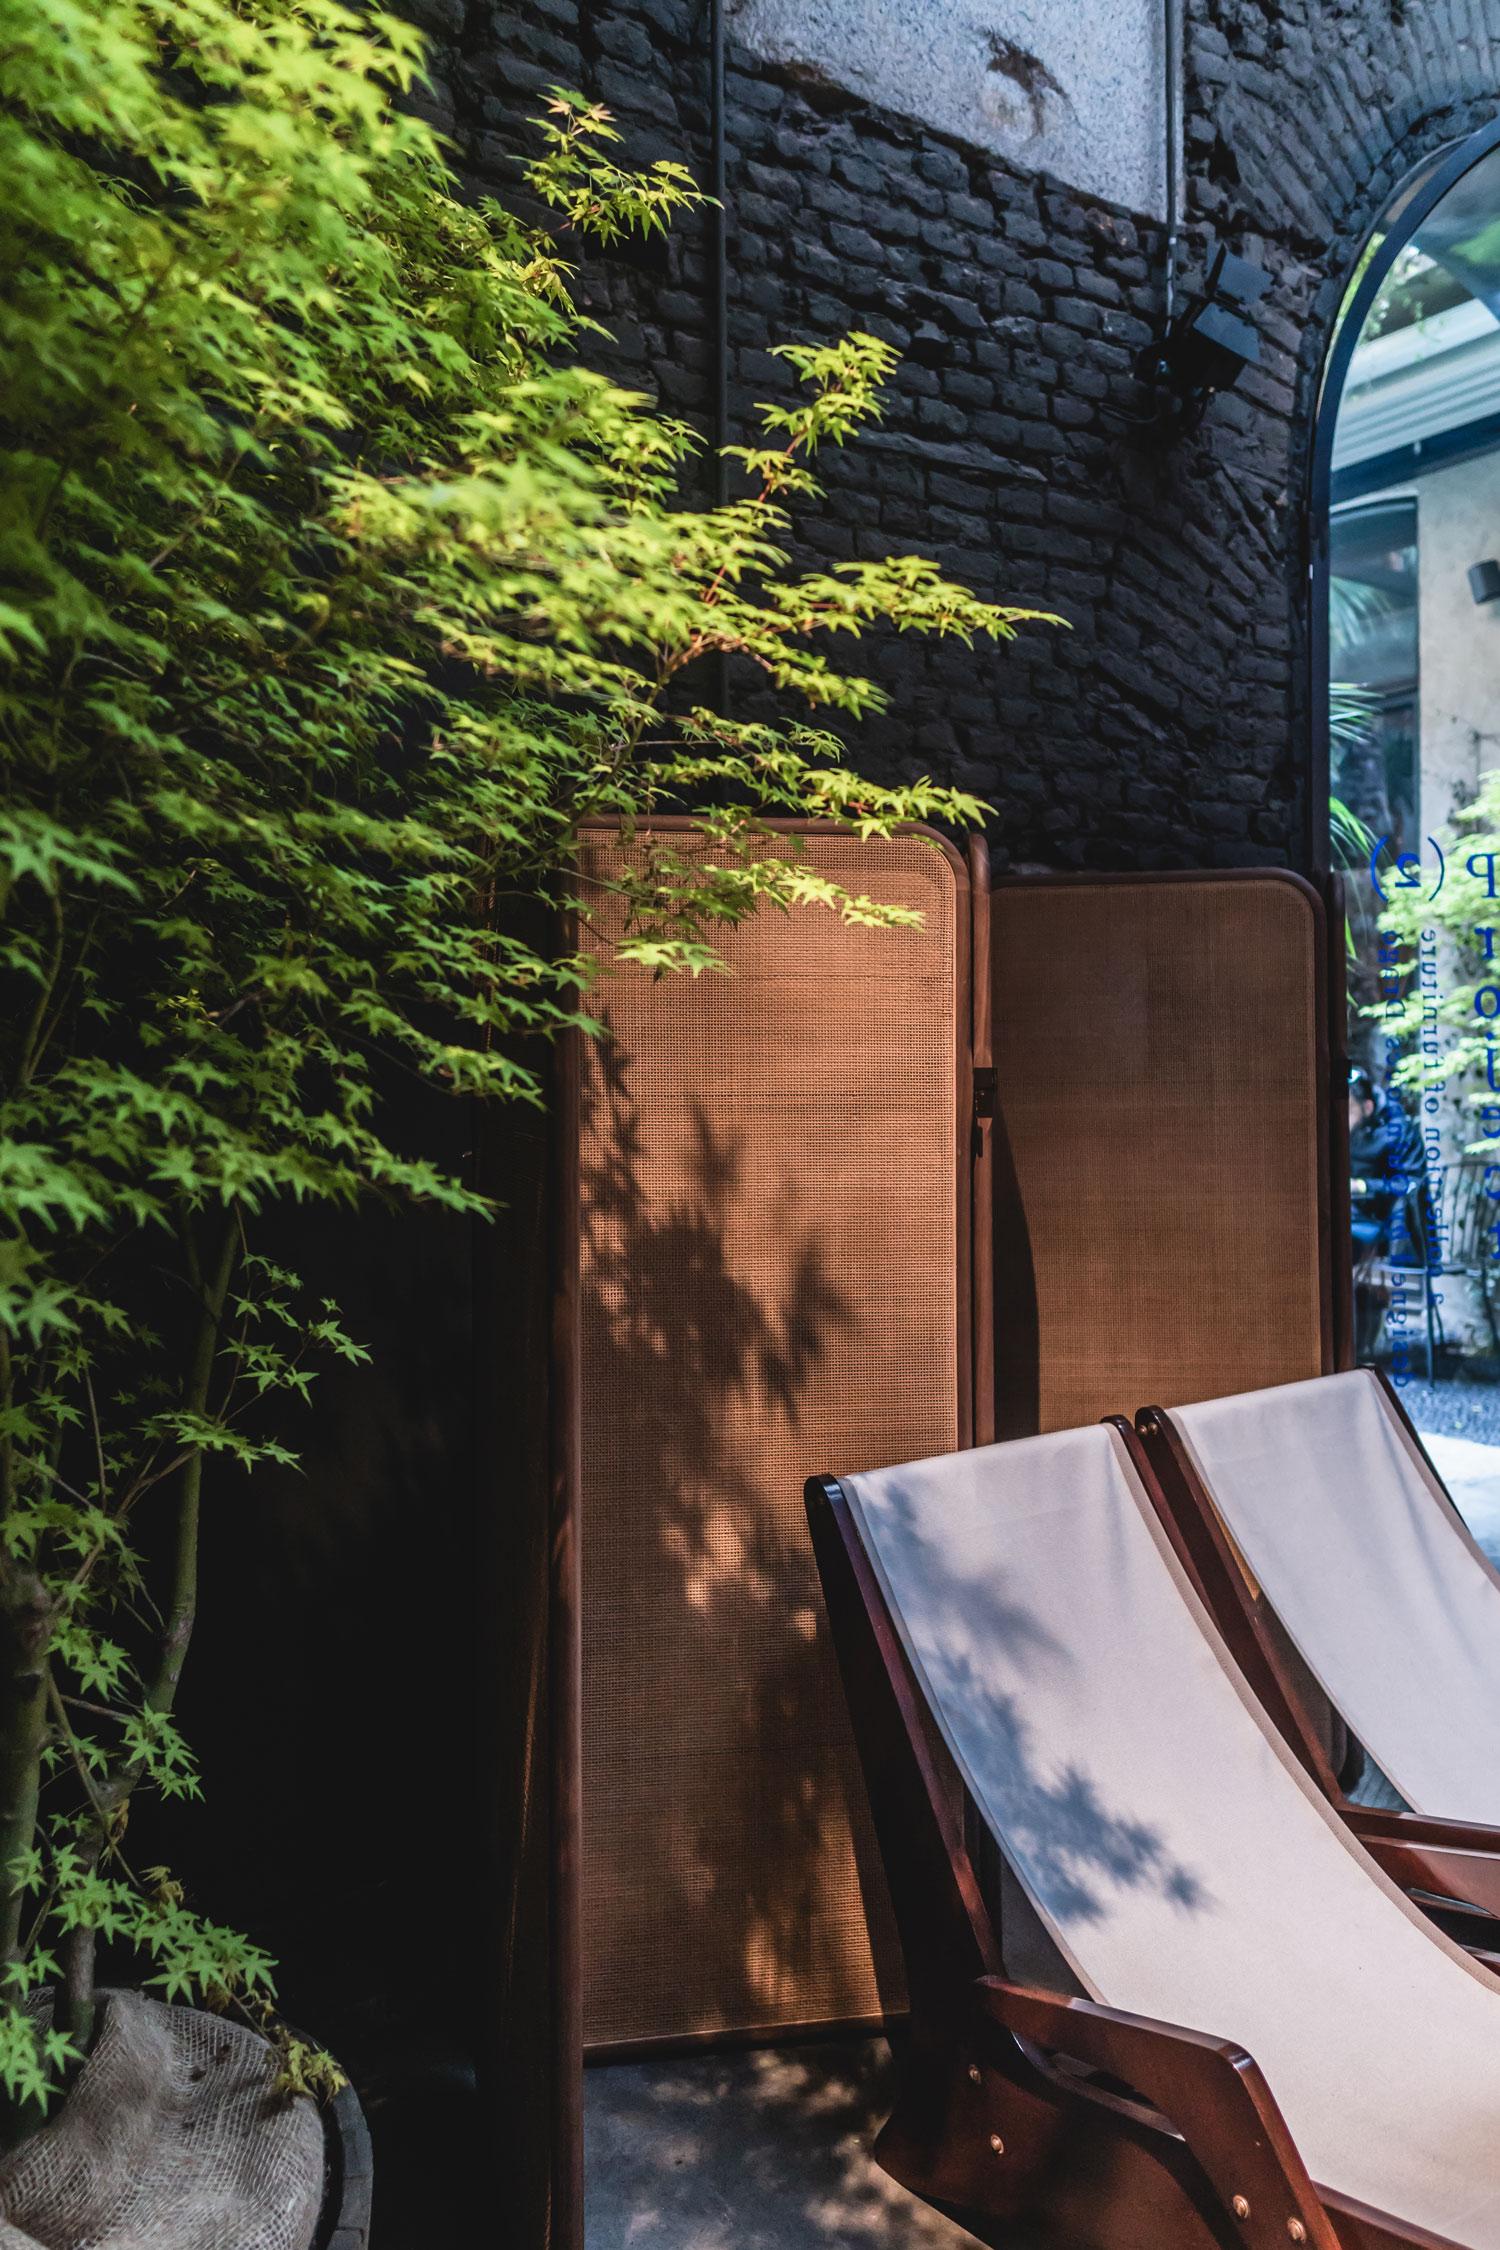 Interior design trends for 2020_Interior design trends 2020_Authentic Interior design blog_interior design trends for 2020